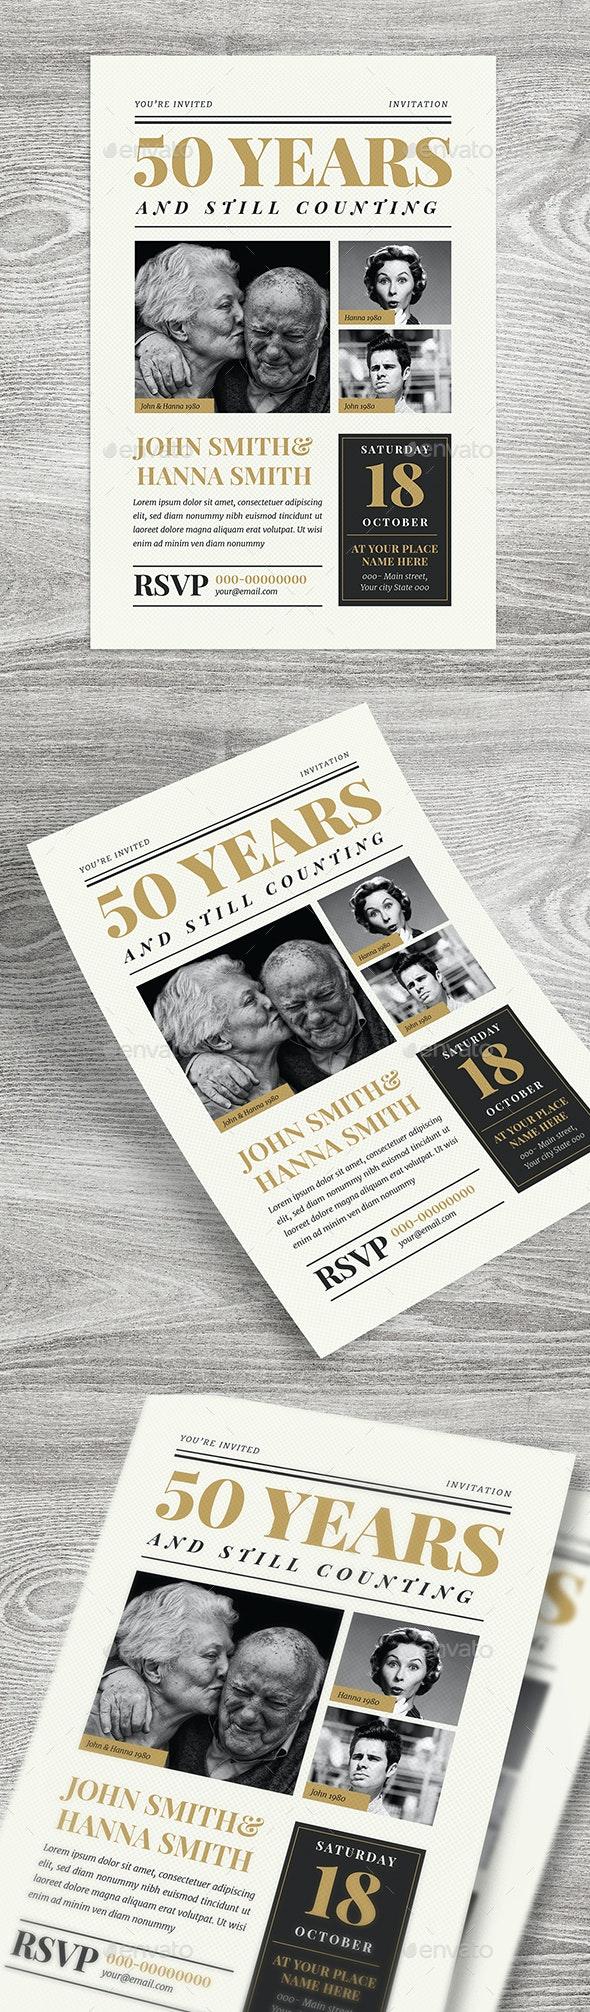 Newspaper Wedding Anniversary Invitation - Cards & Invites Print Templates